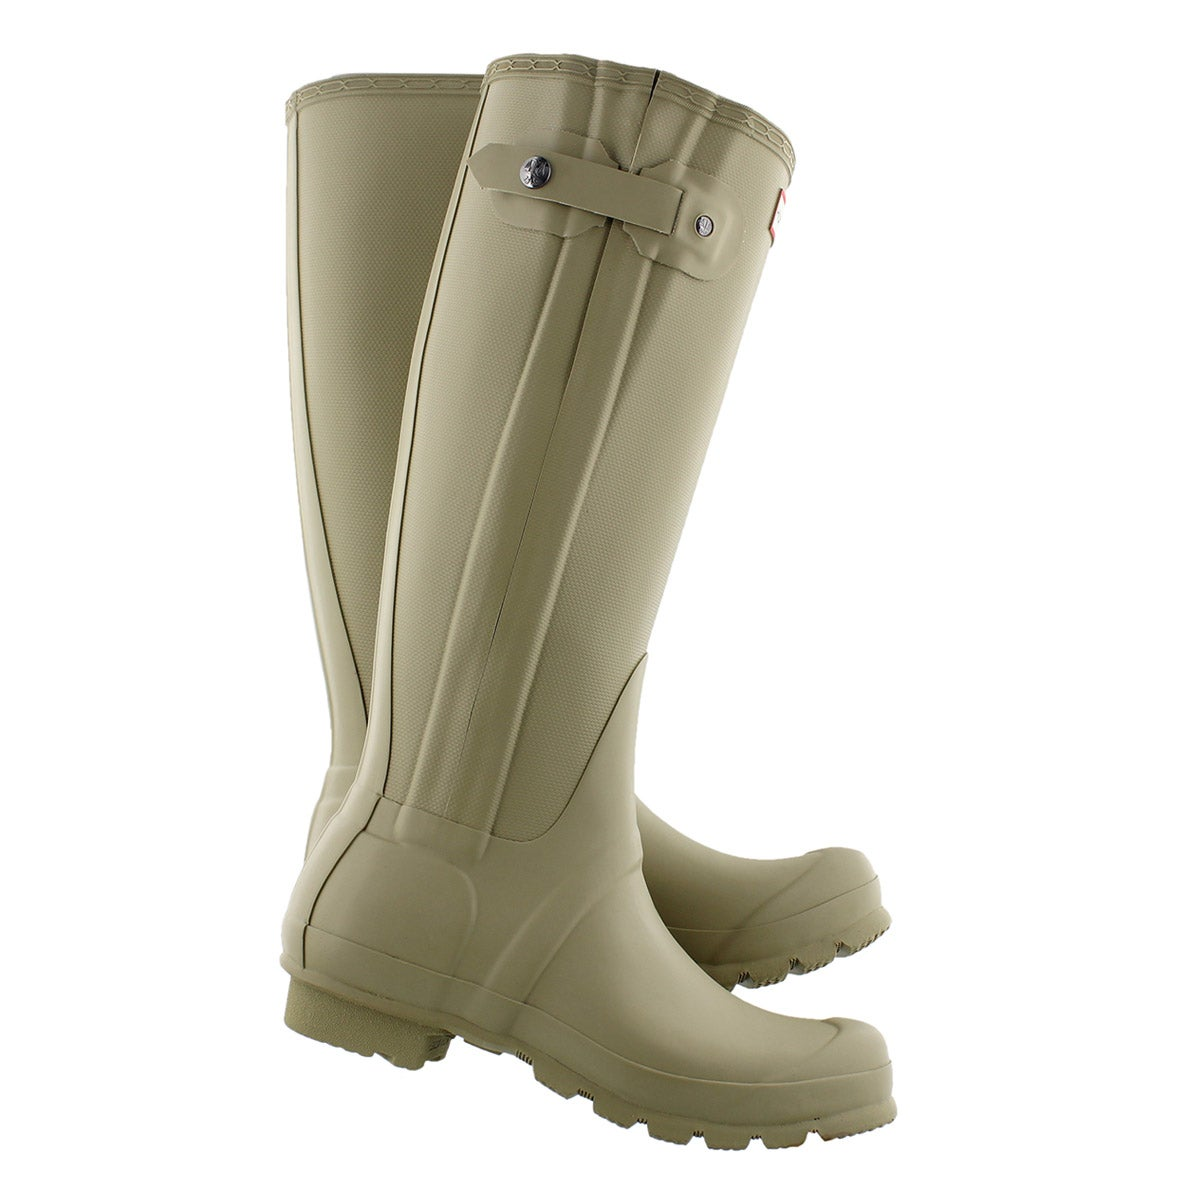 Lds Origi Slim Textured Leg sge rainboot